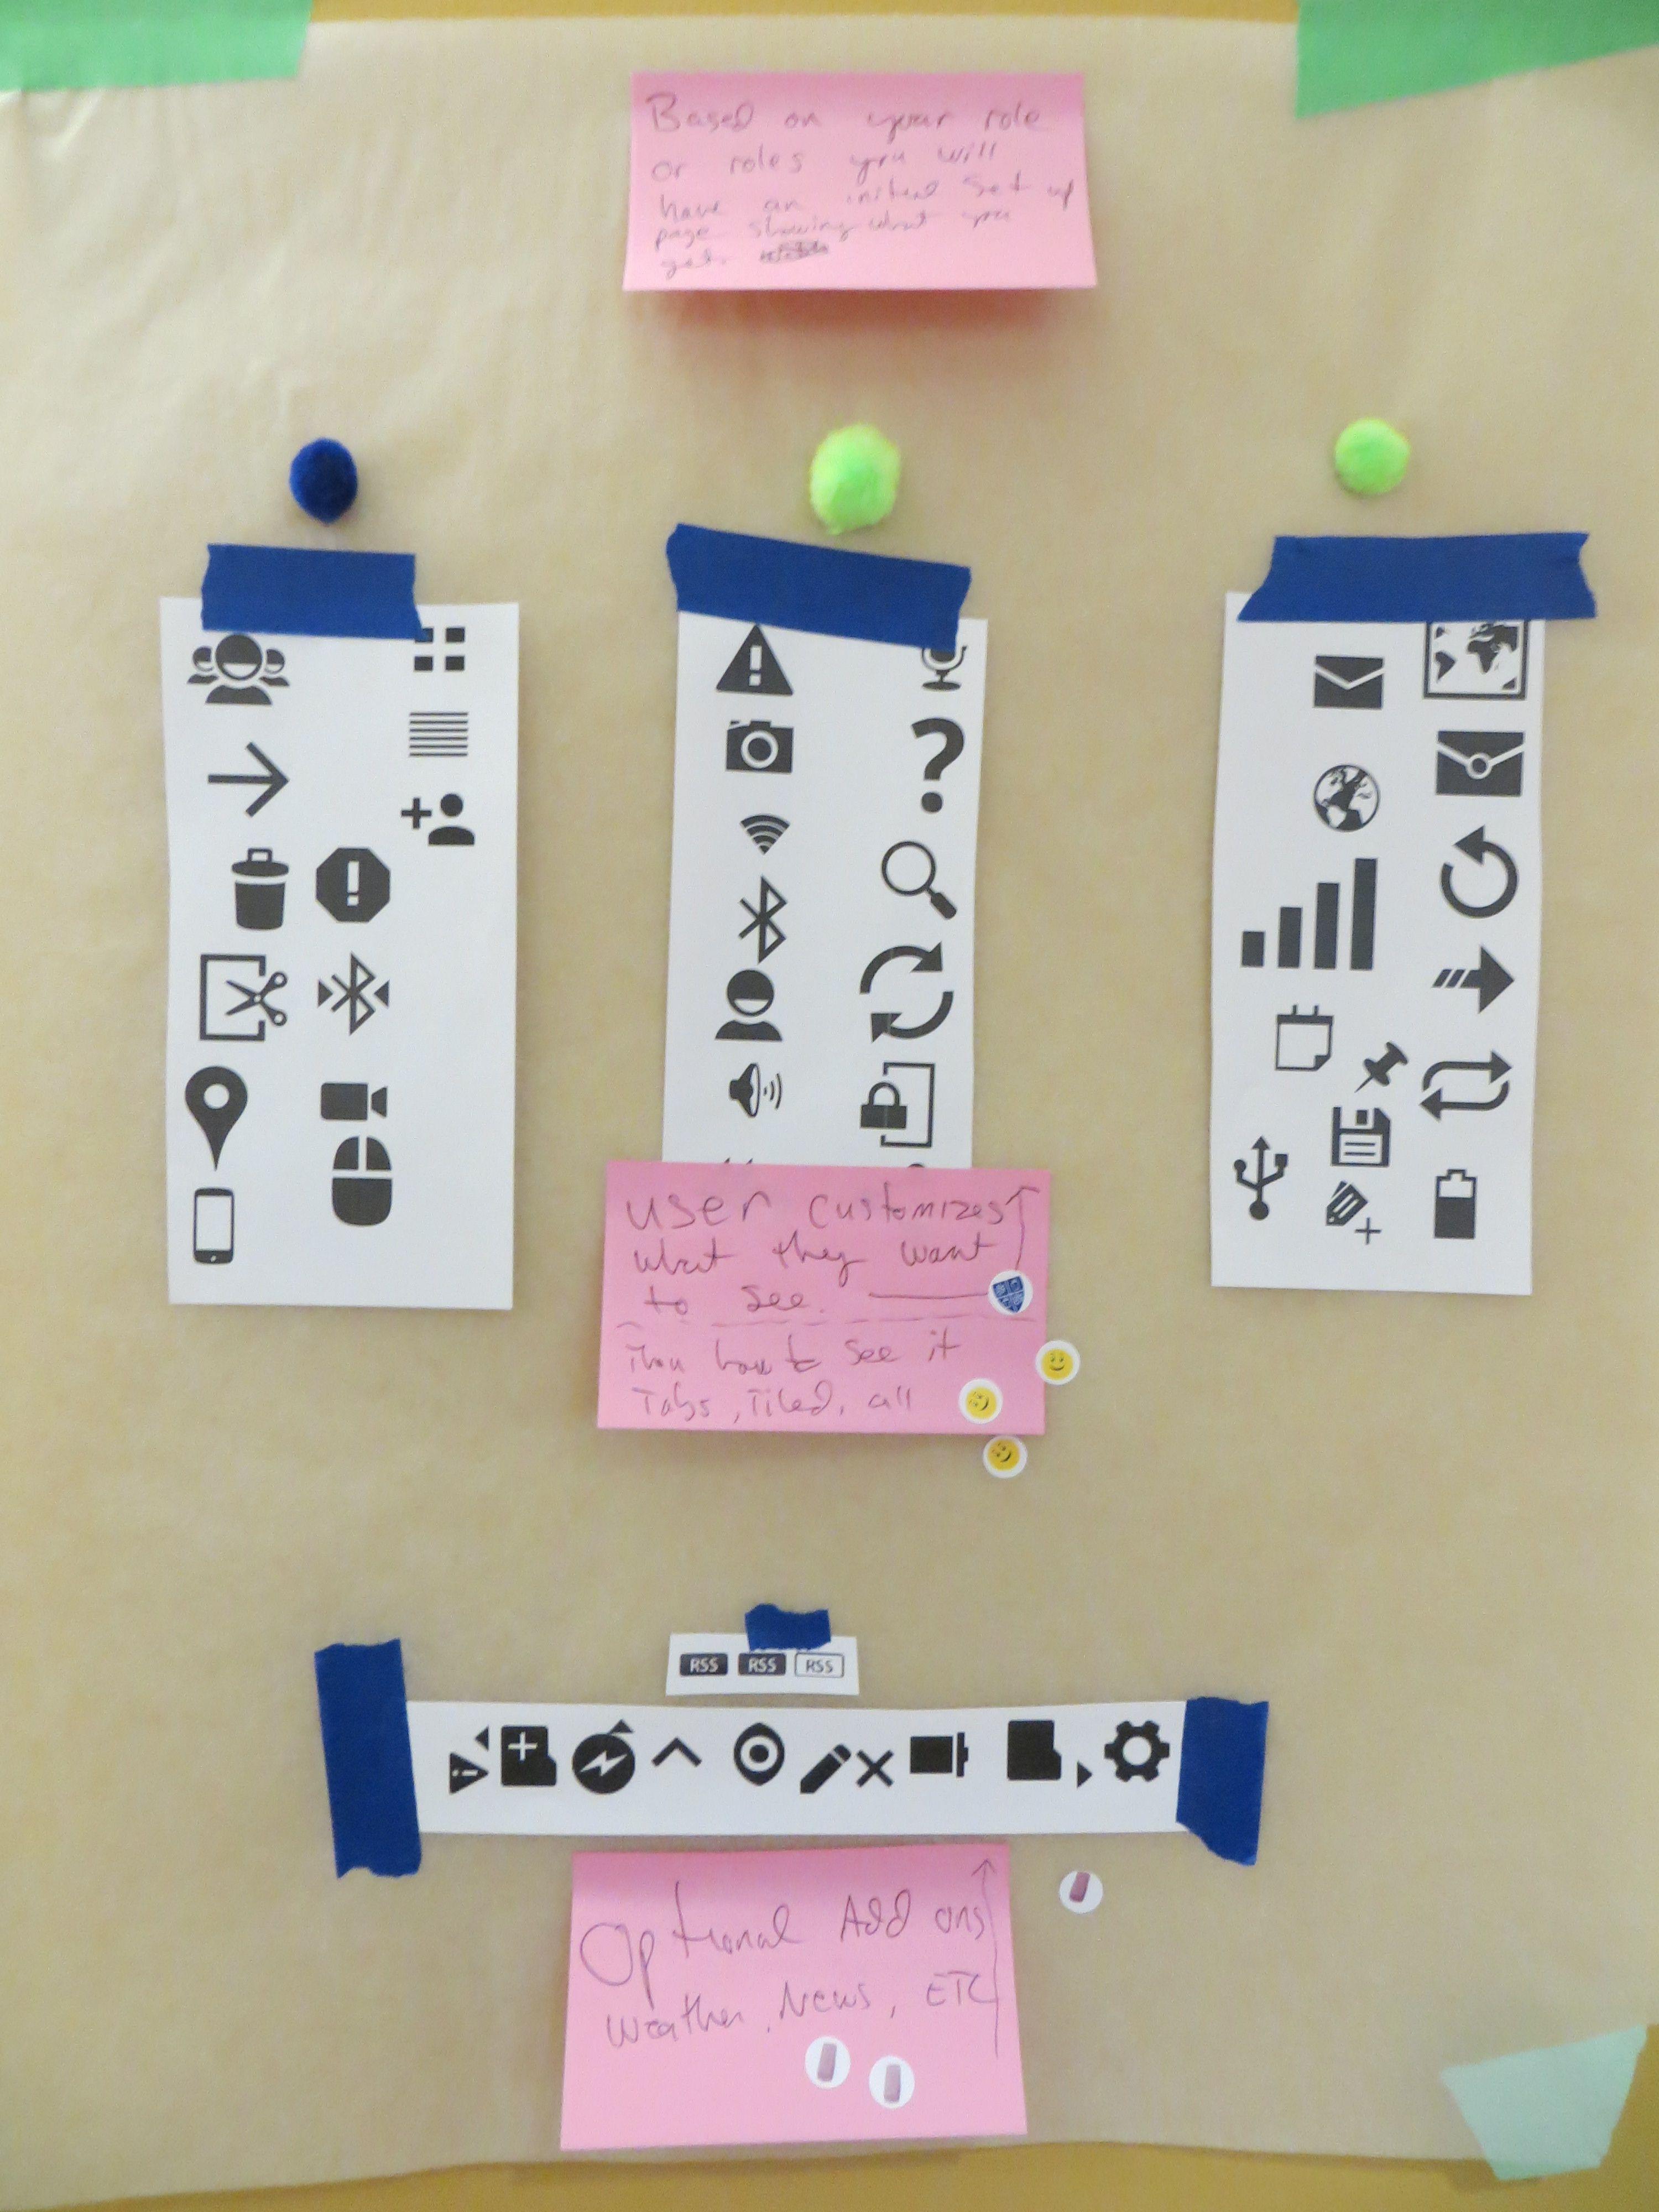 Pin on Design Thinking Prototypes